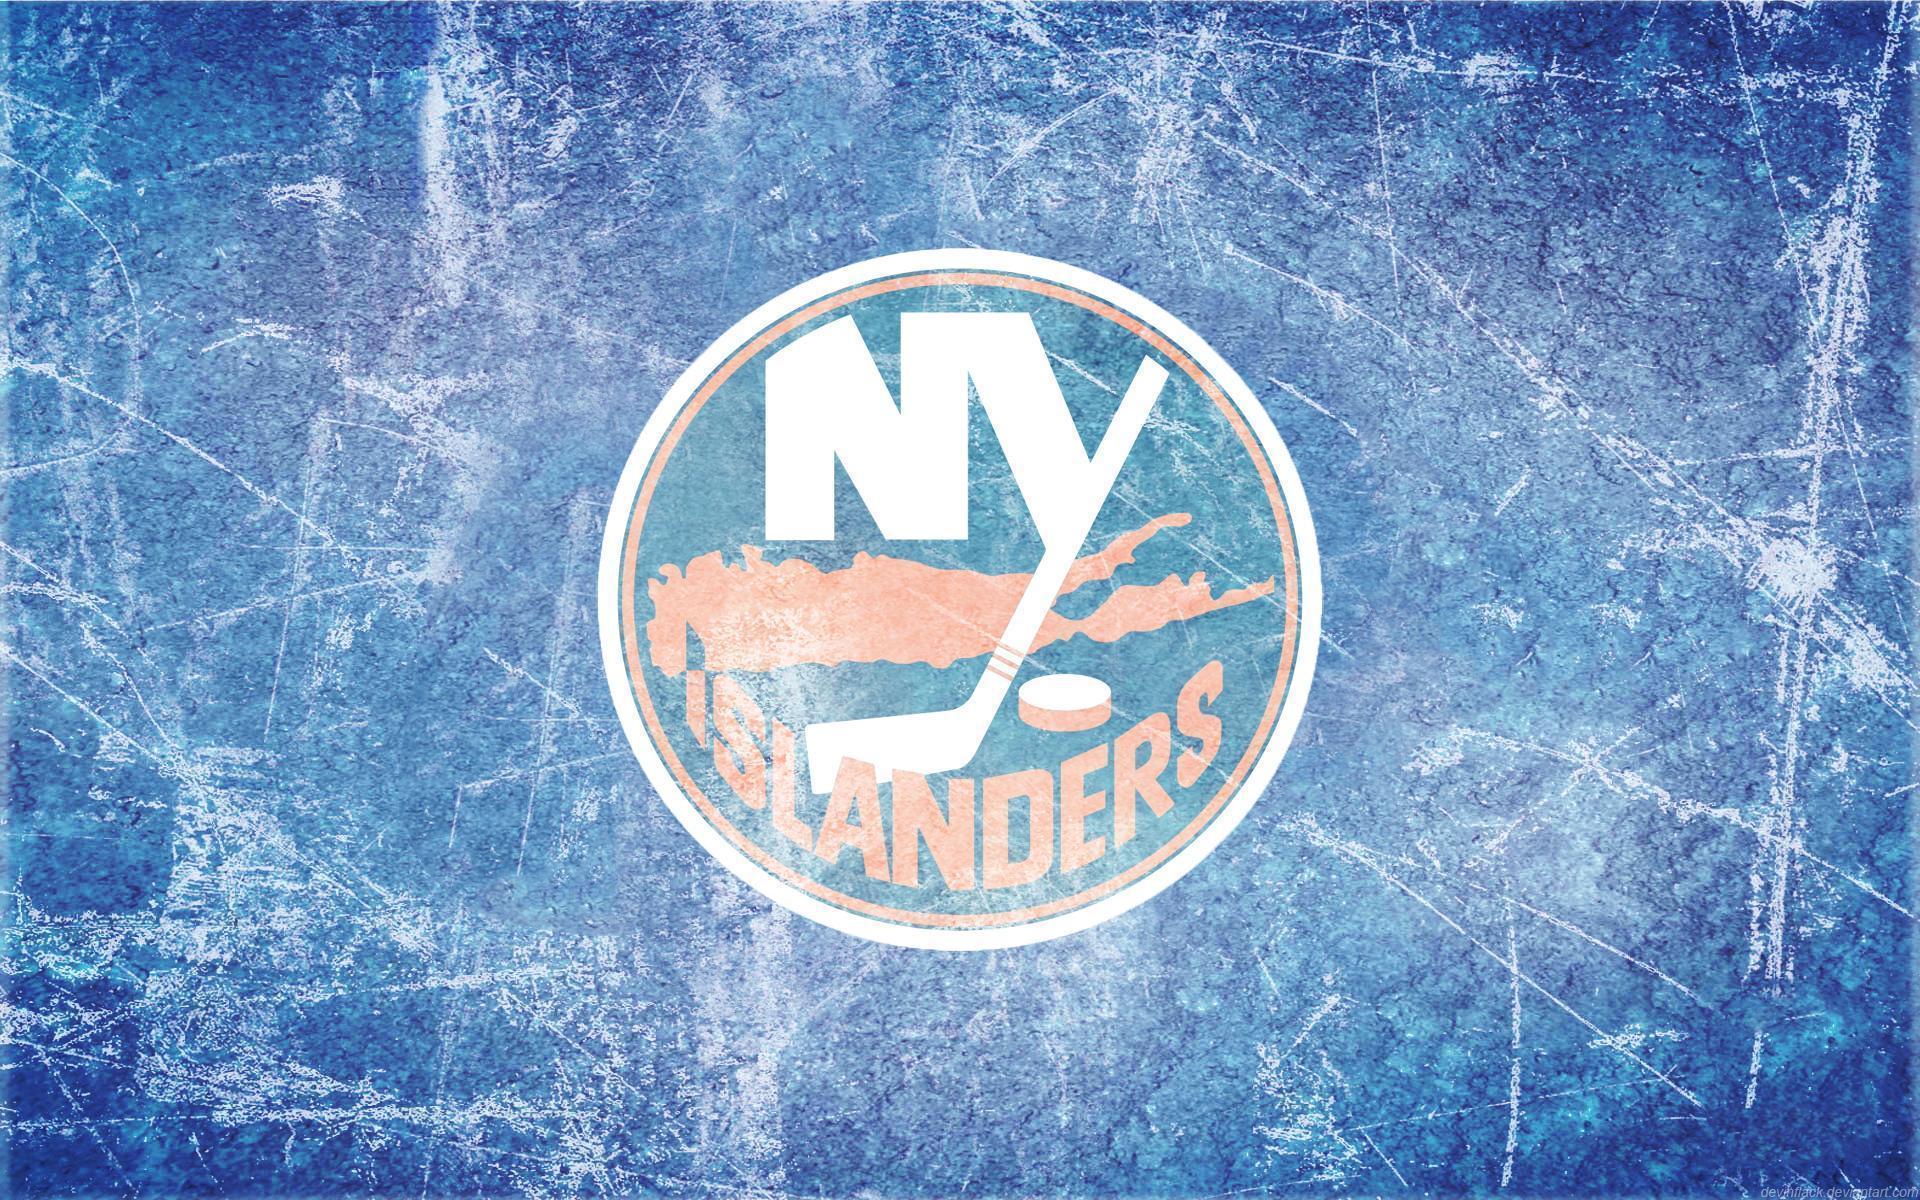 New York Rangers Wallpaper Hd New York Islanders Wallpapers Wallpaper Cave